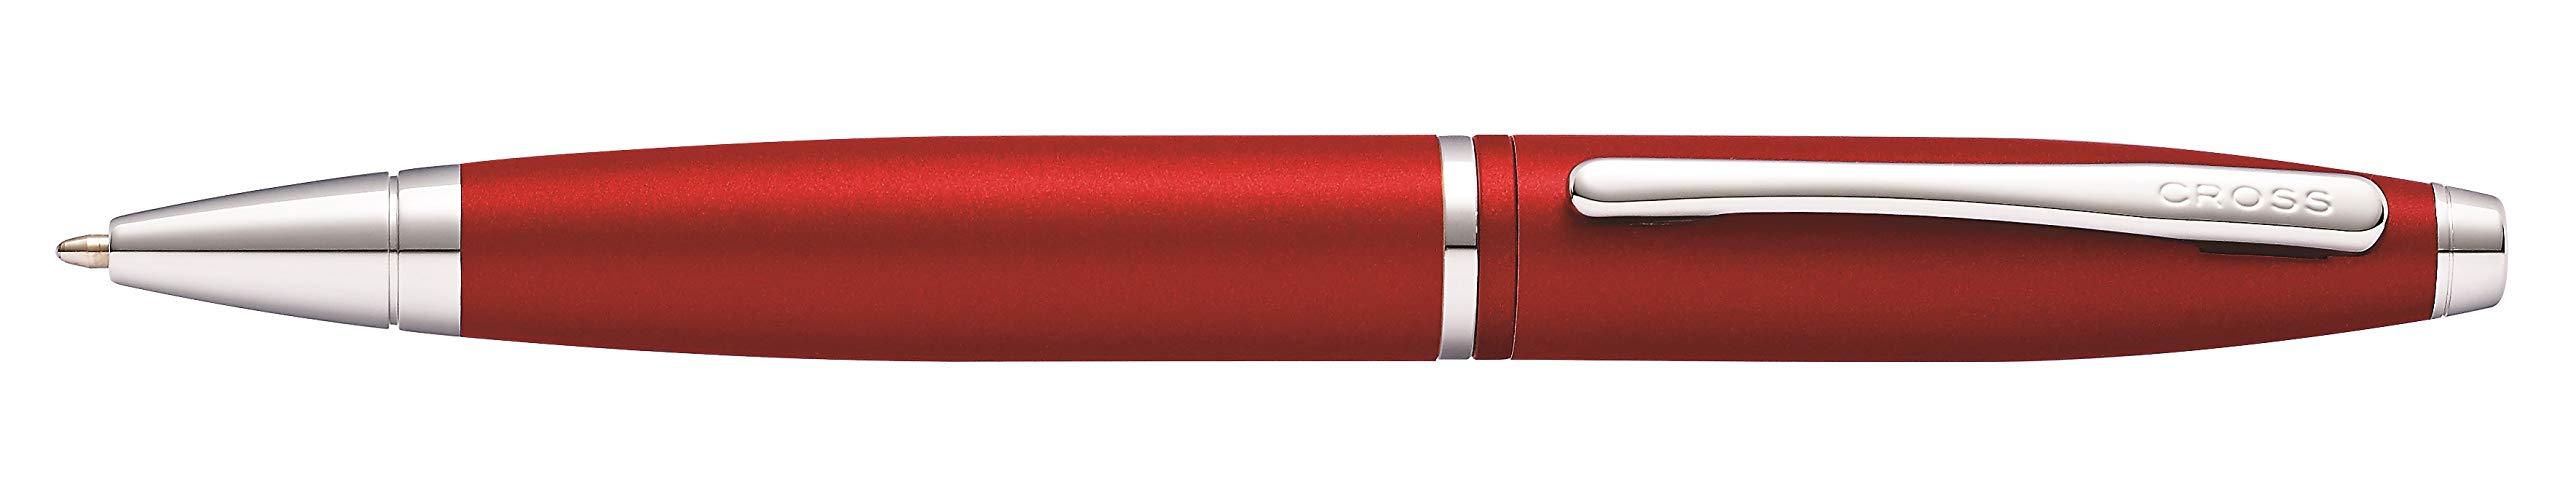 Cross AT0112-19 Calais Matte Metallic Crimson Ballpoint Pen